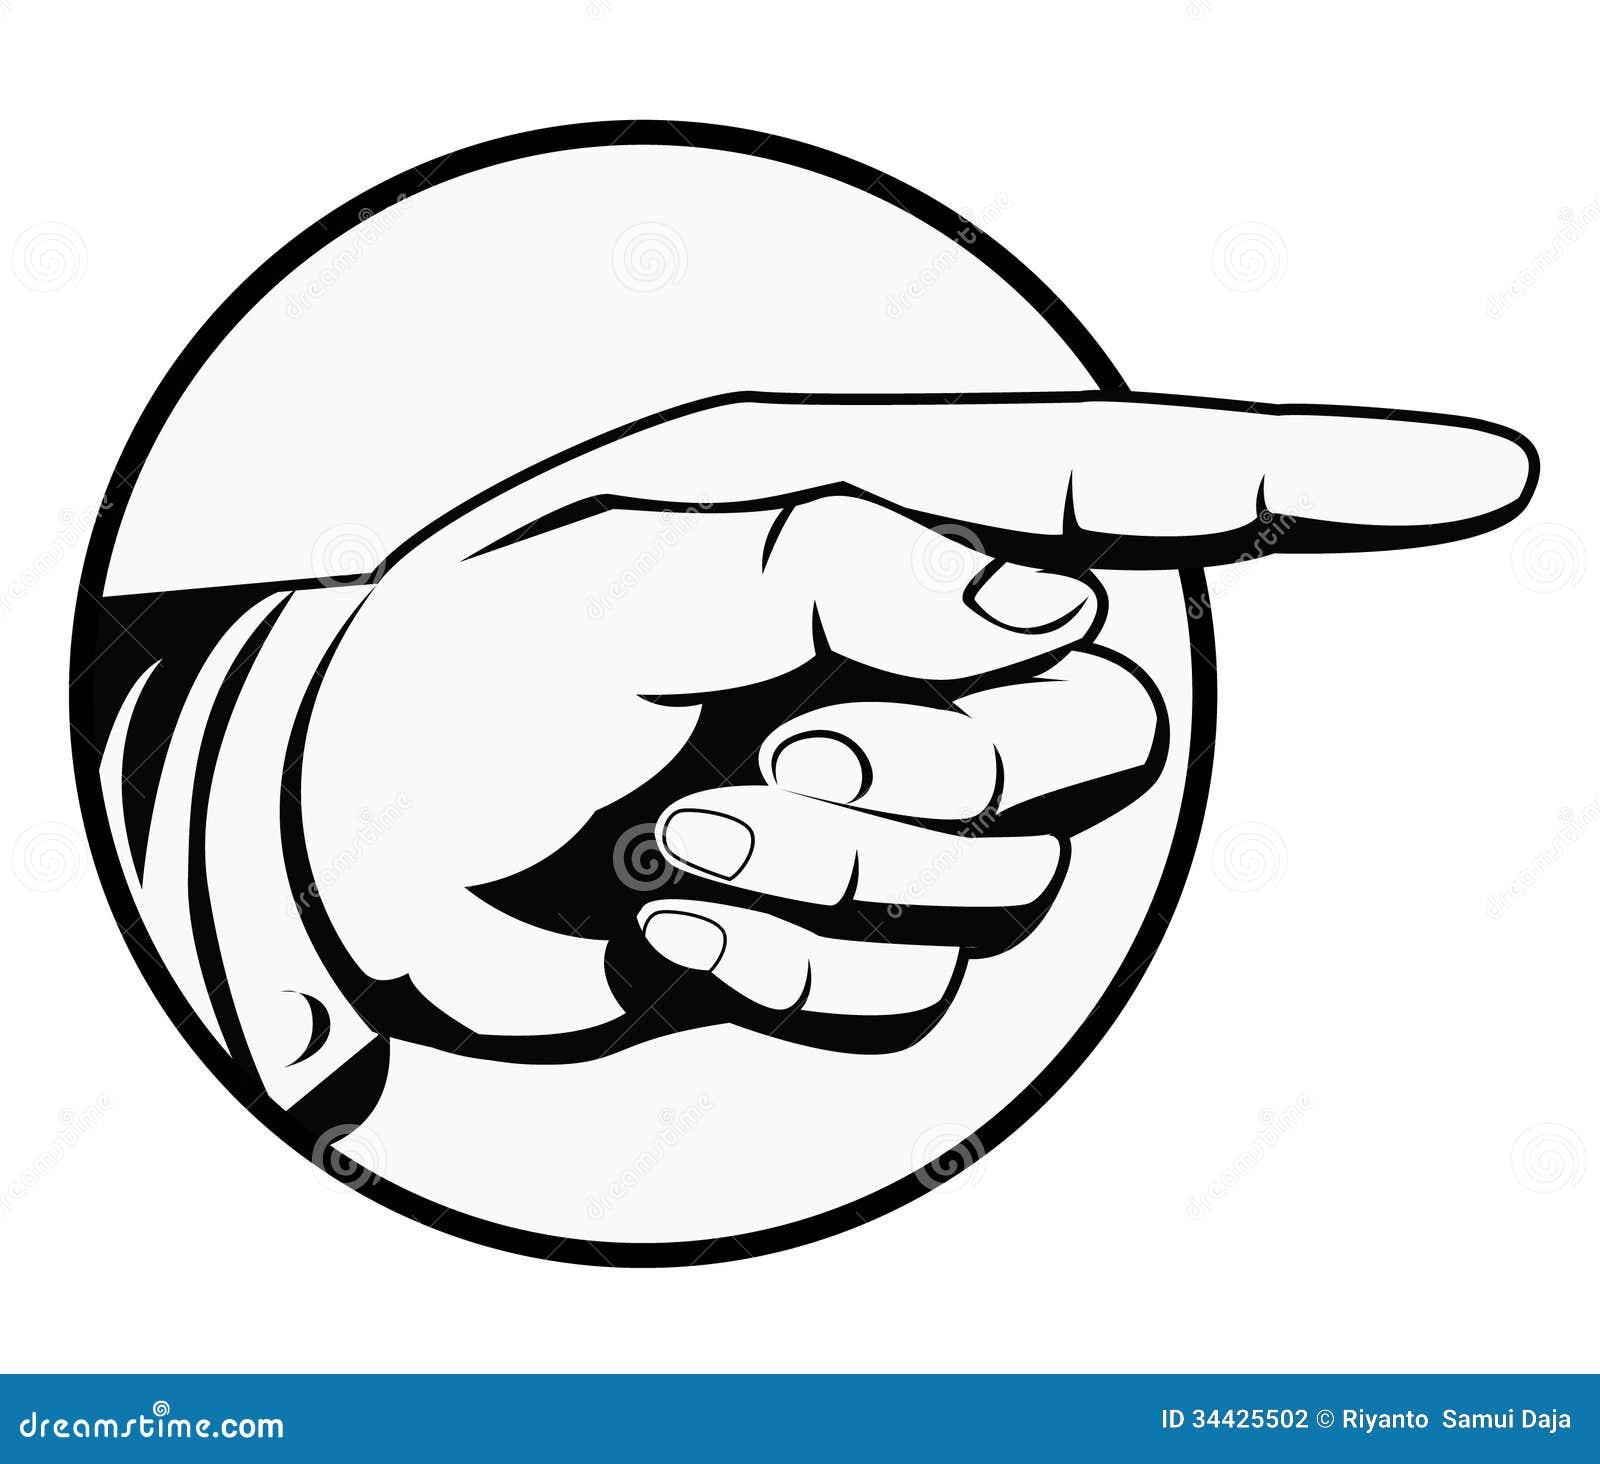 Image Gallery Symbol Hand